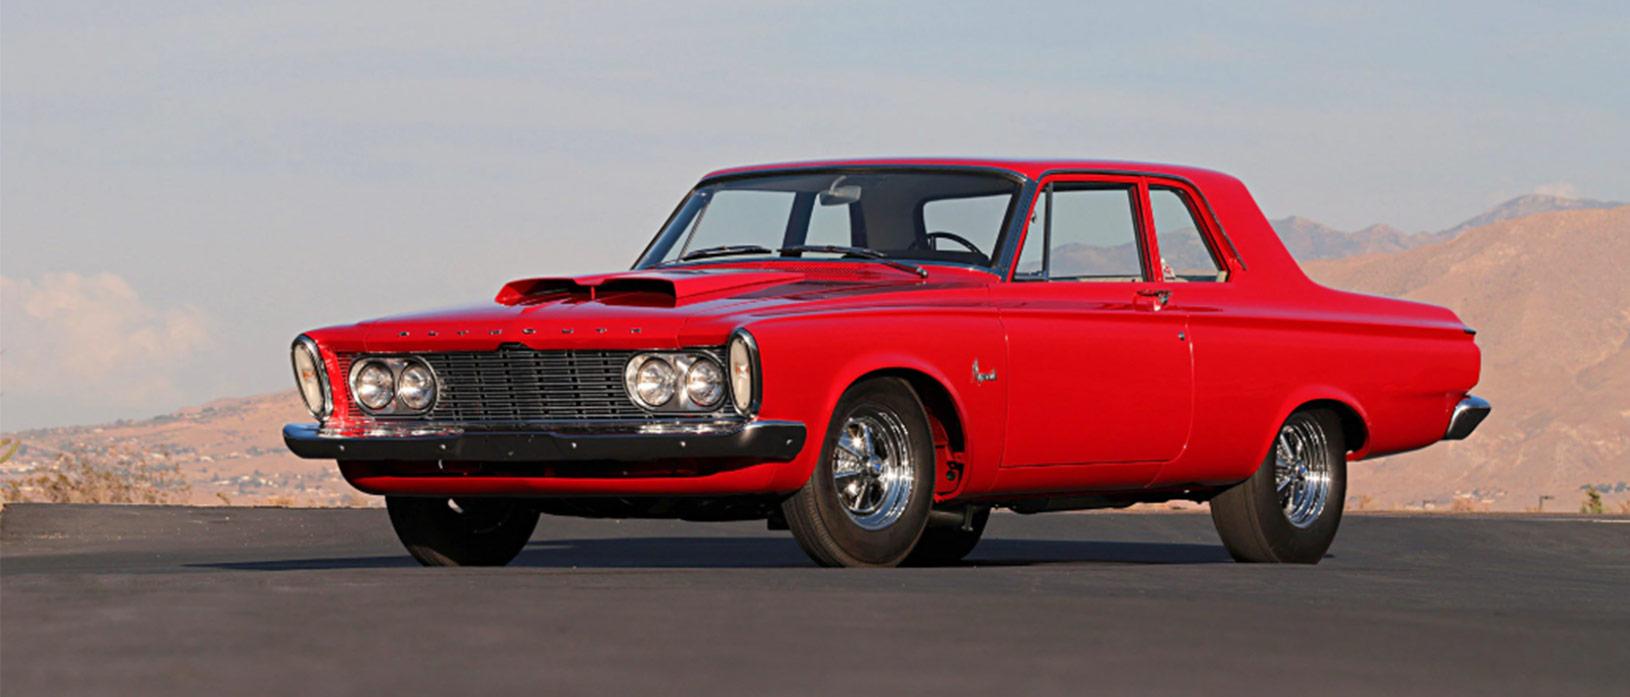 1963 Plymouth Savoy Super Stock